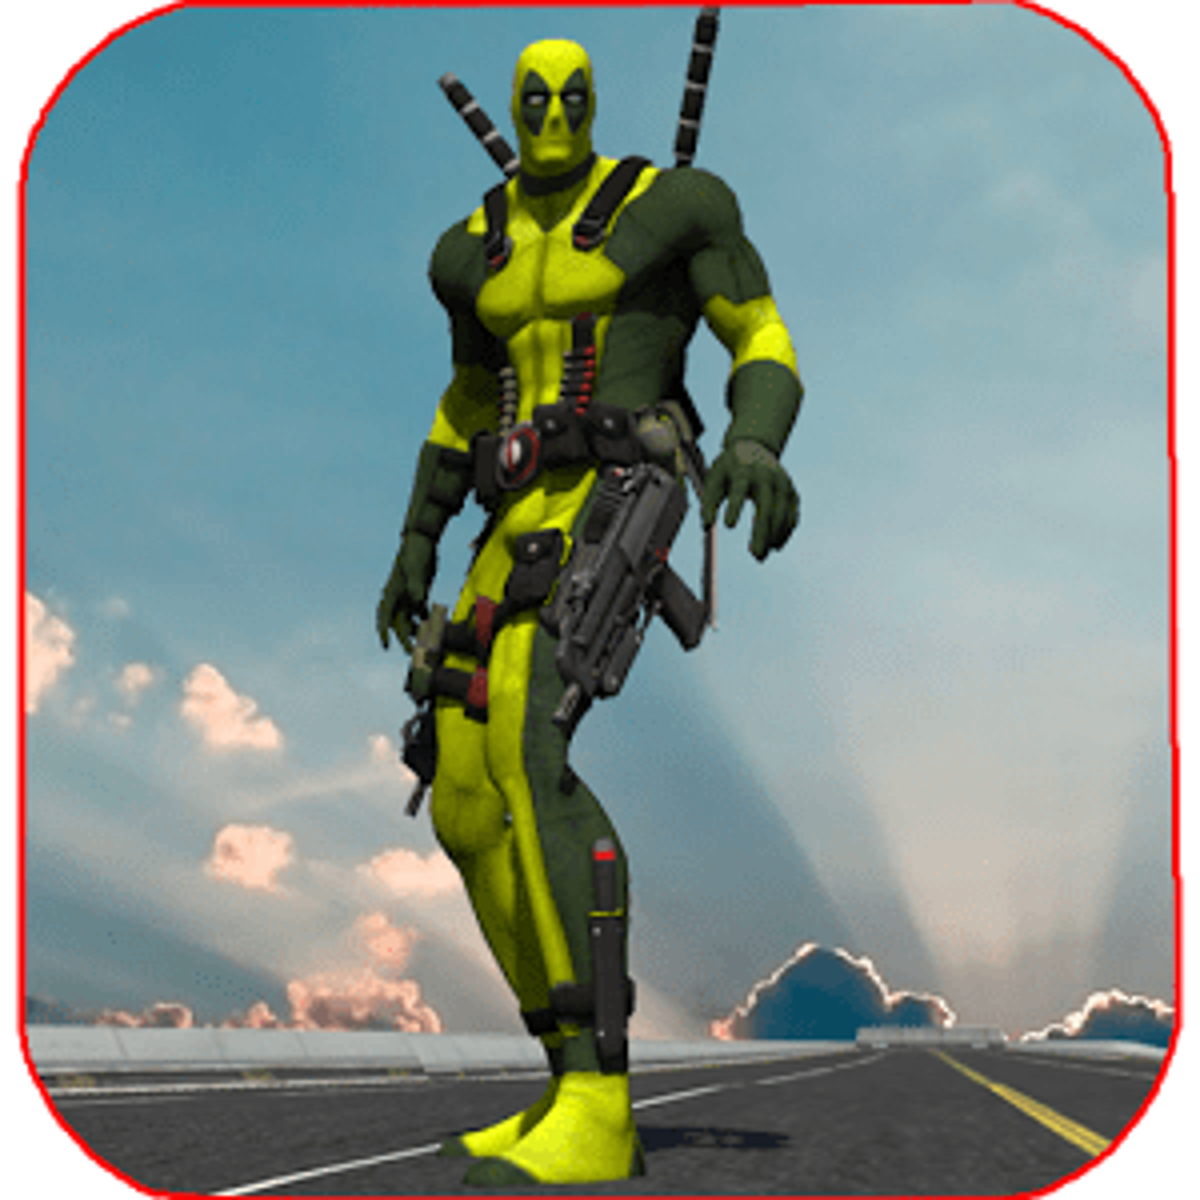 Rope Man VS Superhero Robot 1.0